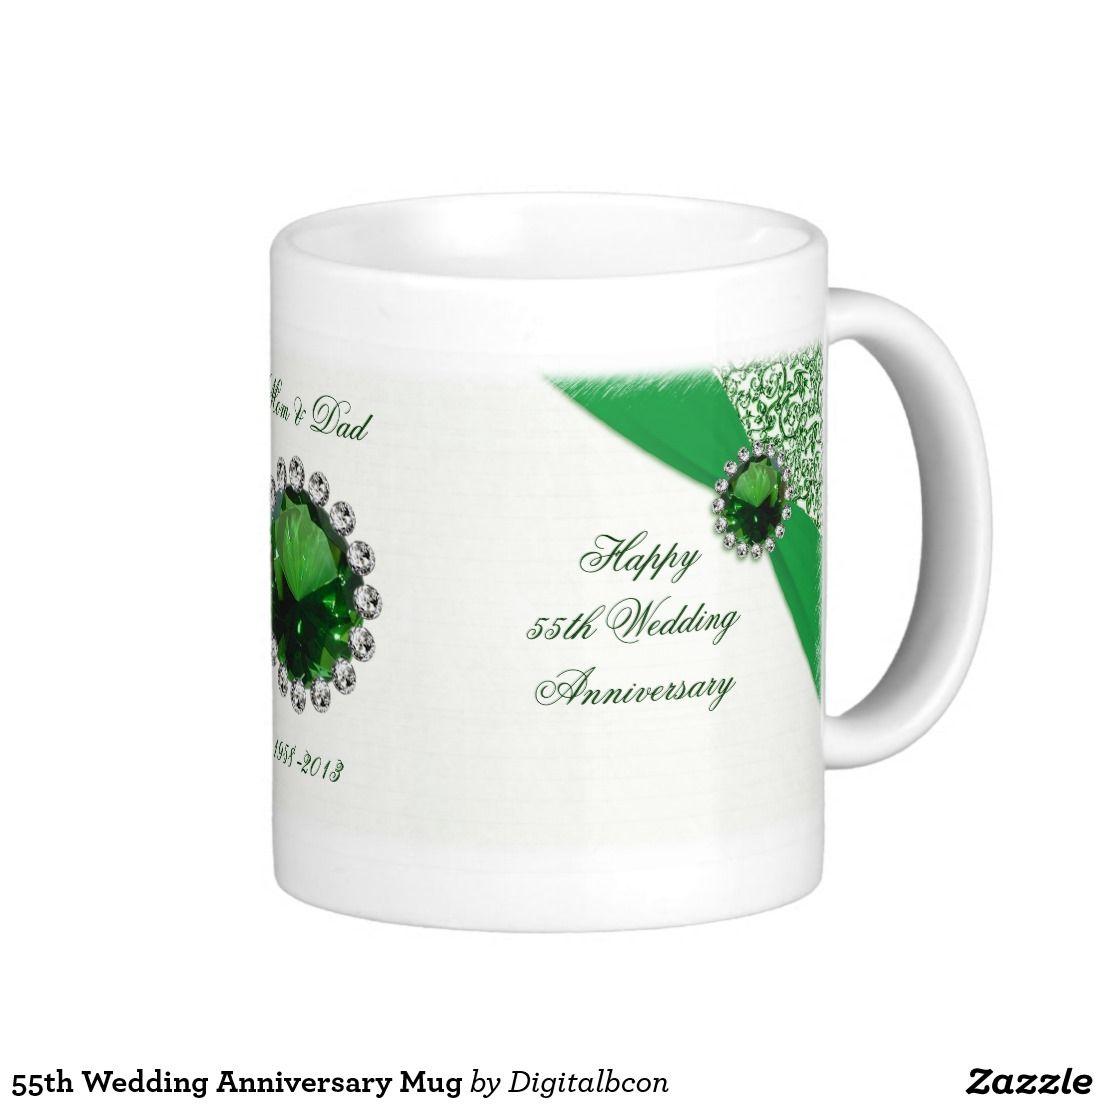 55th Wedding Anniversary Mug Wedding Anniversary